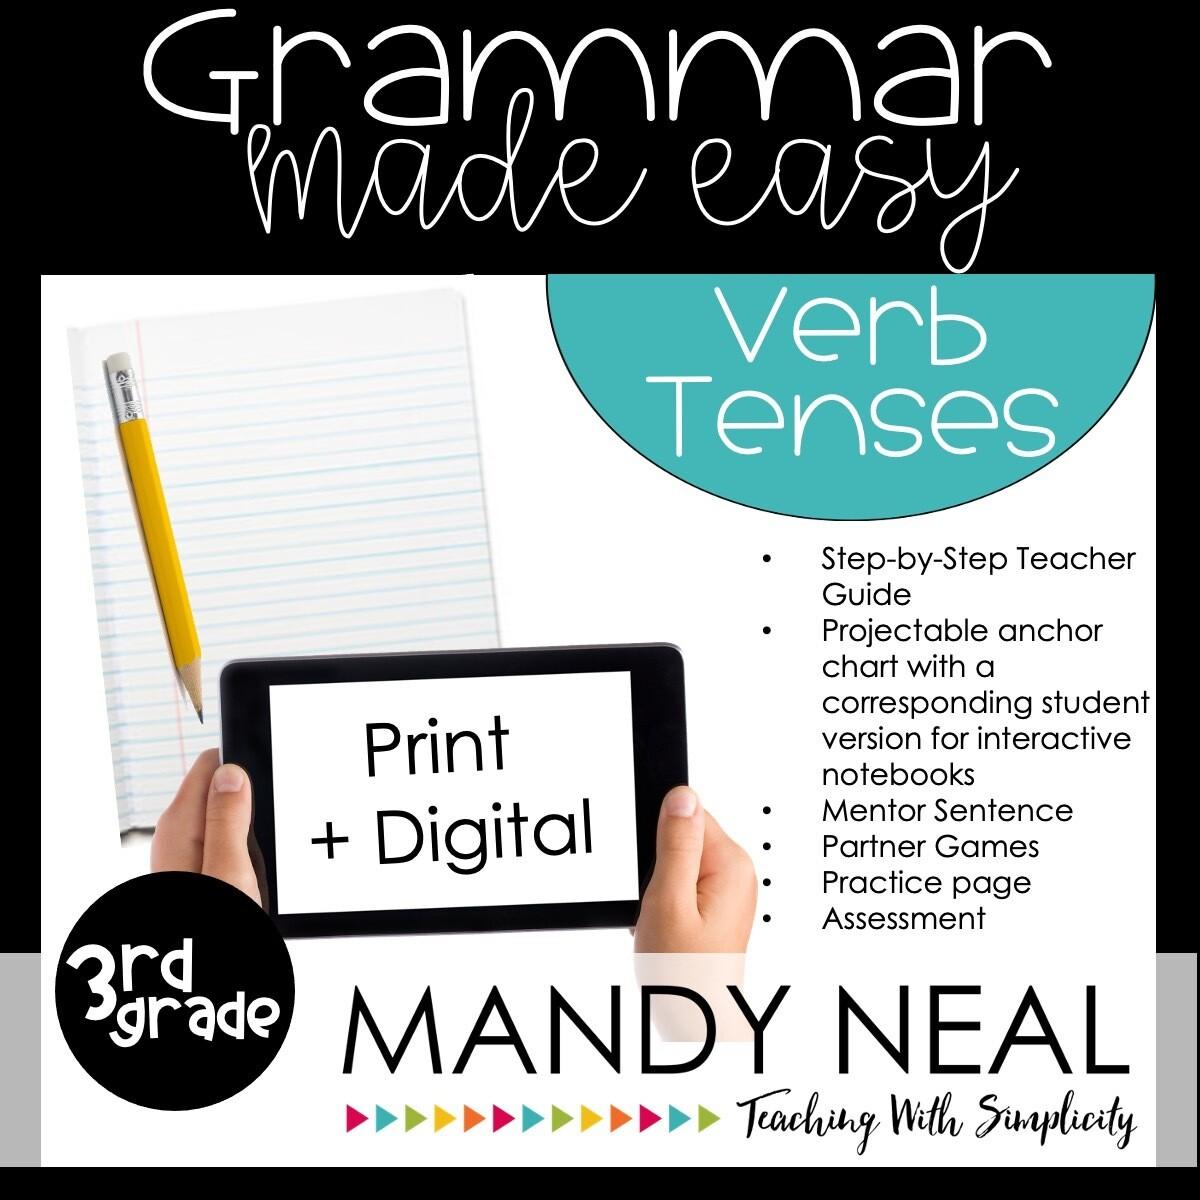 Print + Digital Third Grade Grammar Activities (Verb Tenses)